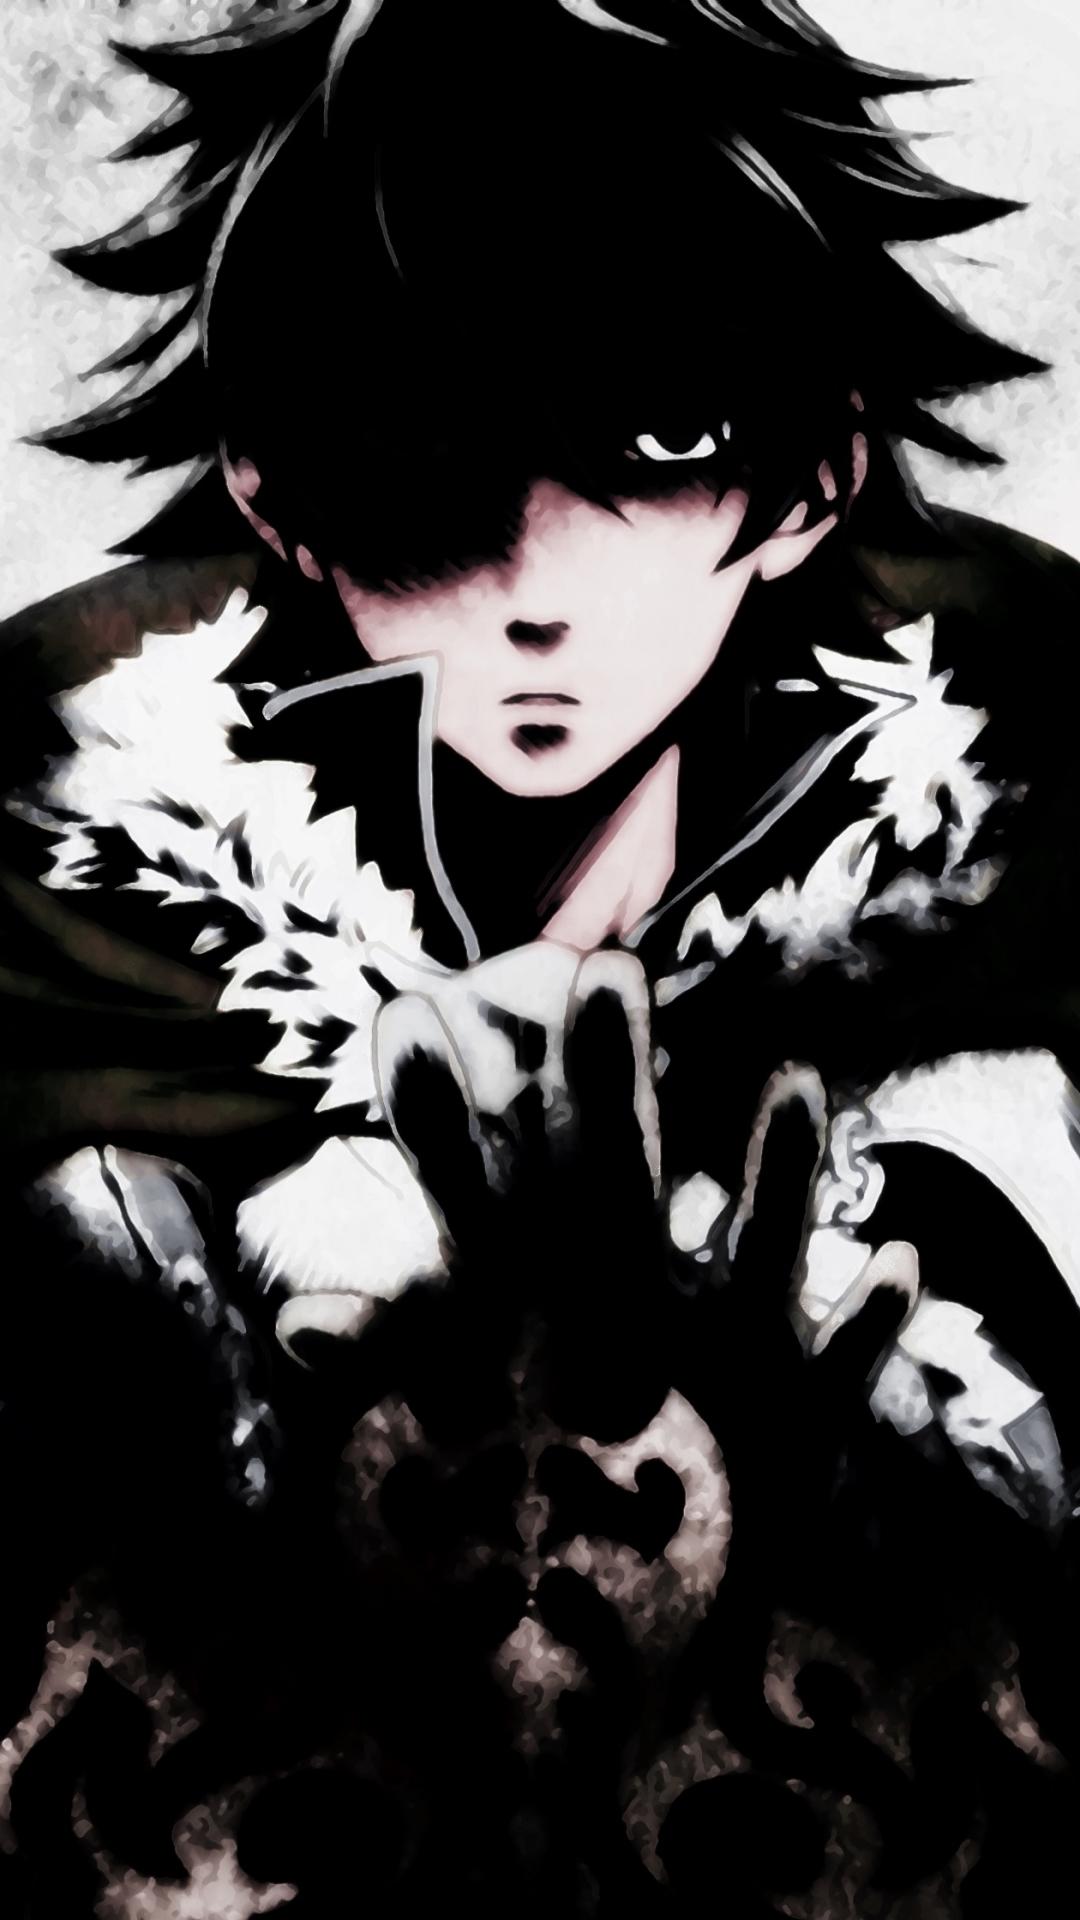 Wallpaper Cool Dark Anime Profile 1080x1920 Download Hd Wallpaper Wallpapertip